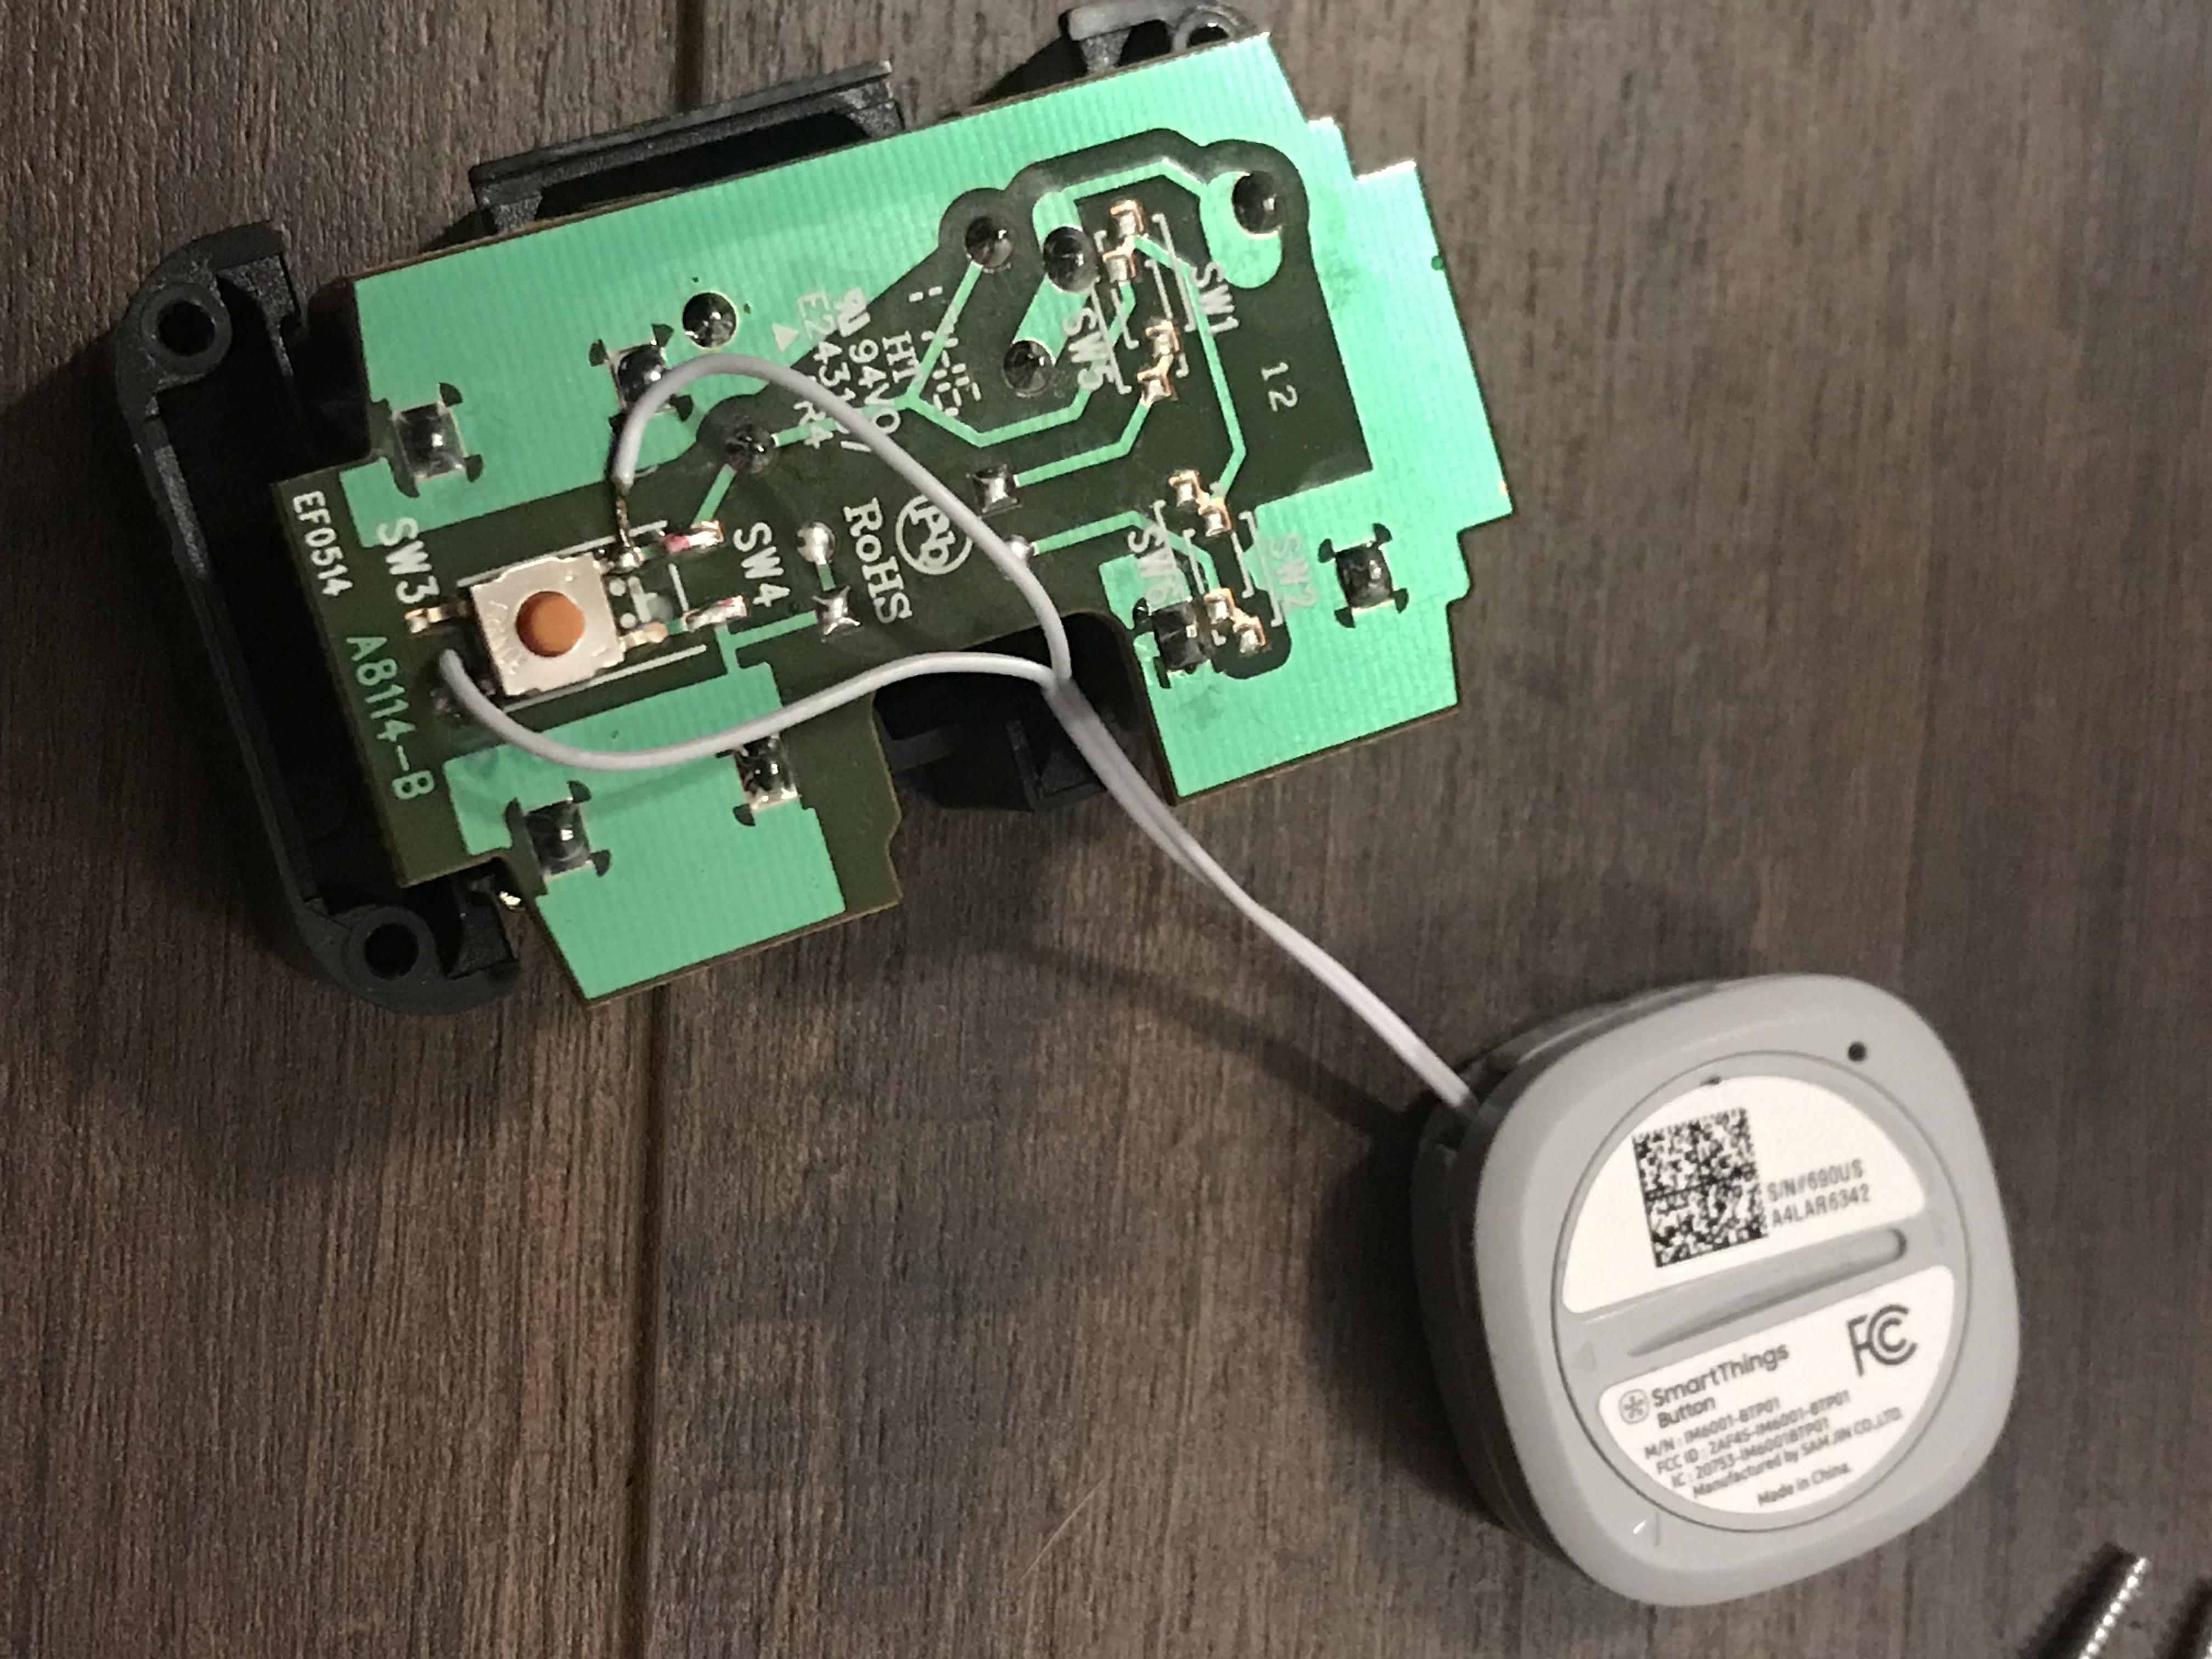 Smartthings Button Teardown (and more!) - Lounge - Hubitat